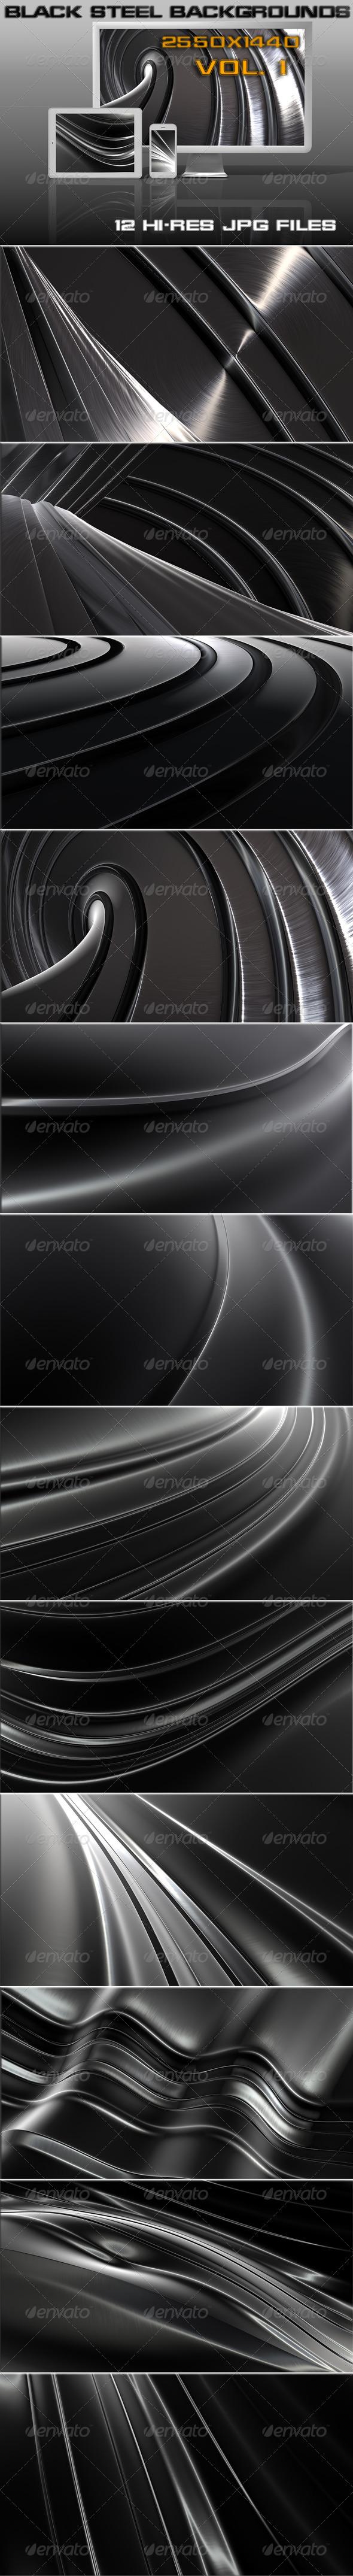 GraphicRiver Black Steel Background 5470646